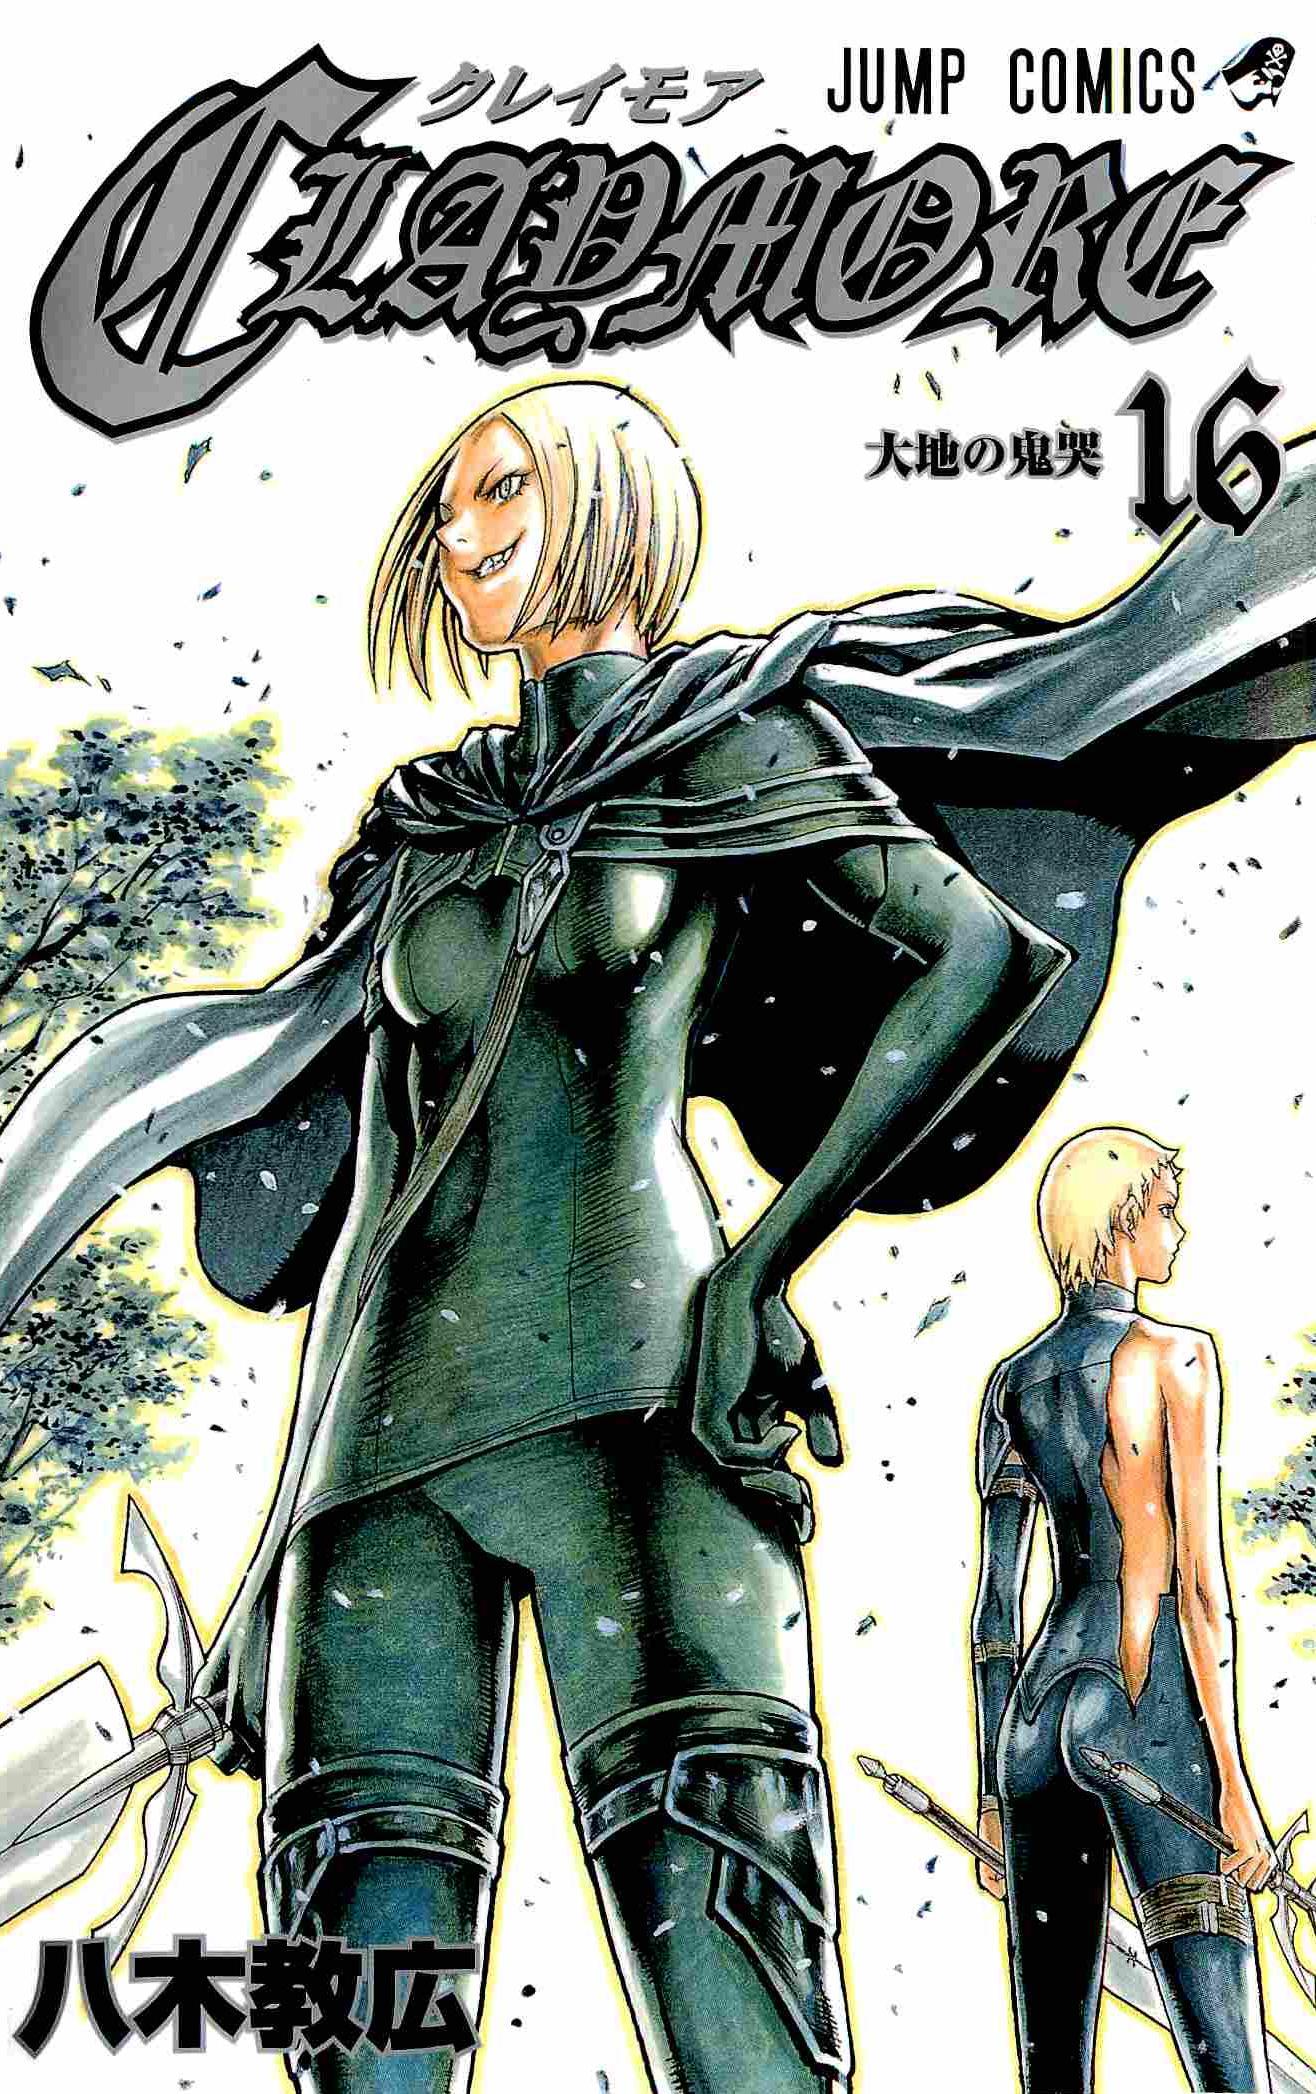 http://img1.wikia.nocookie.net/__cb20100831205649/claymore/images/8/8b/Claymore_manga_v16.jpg